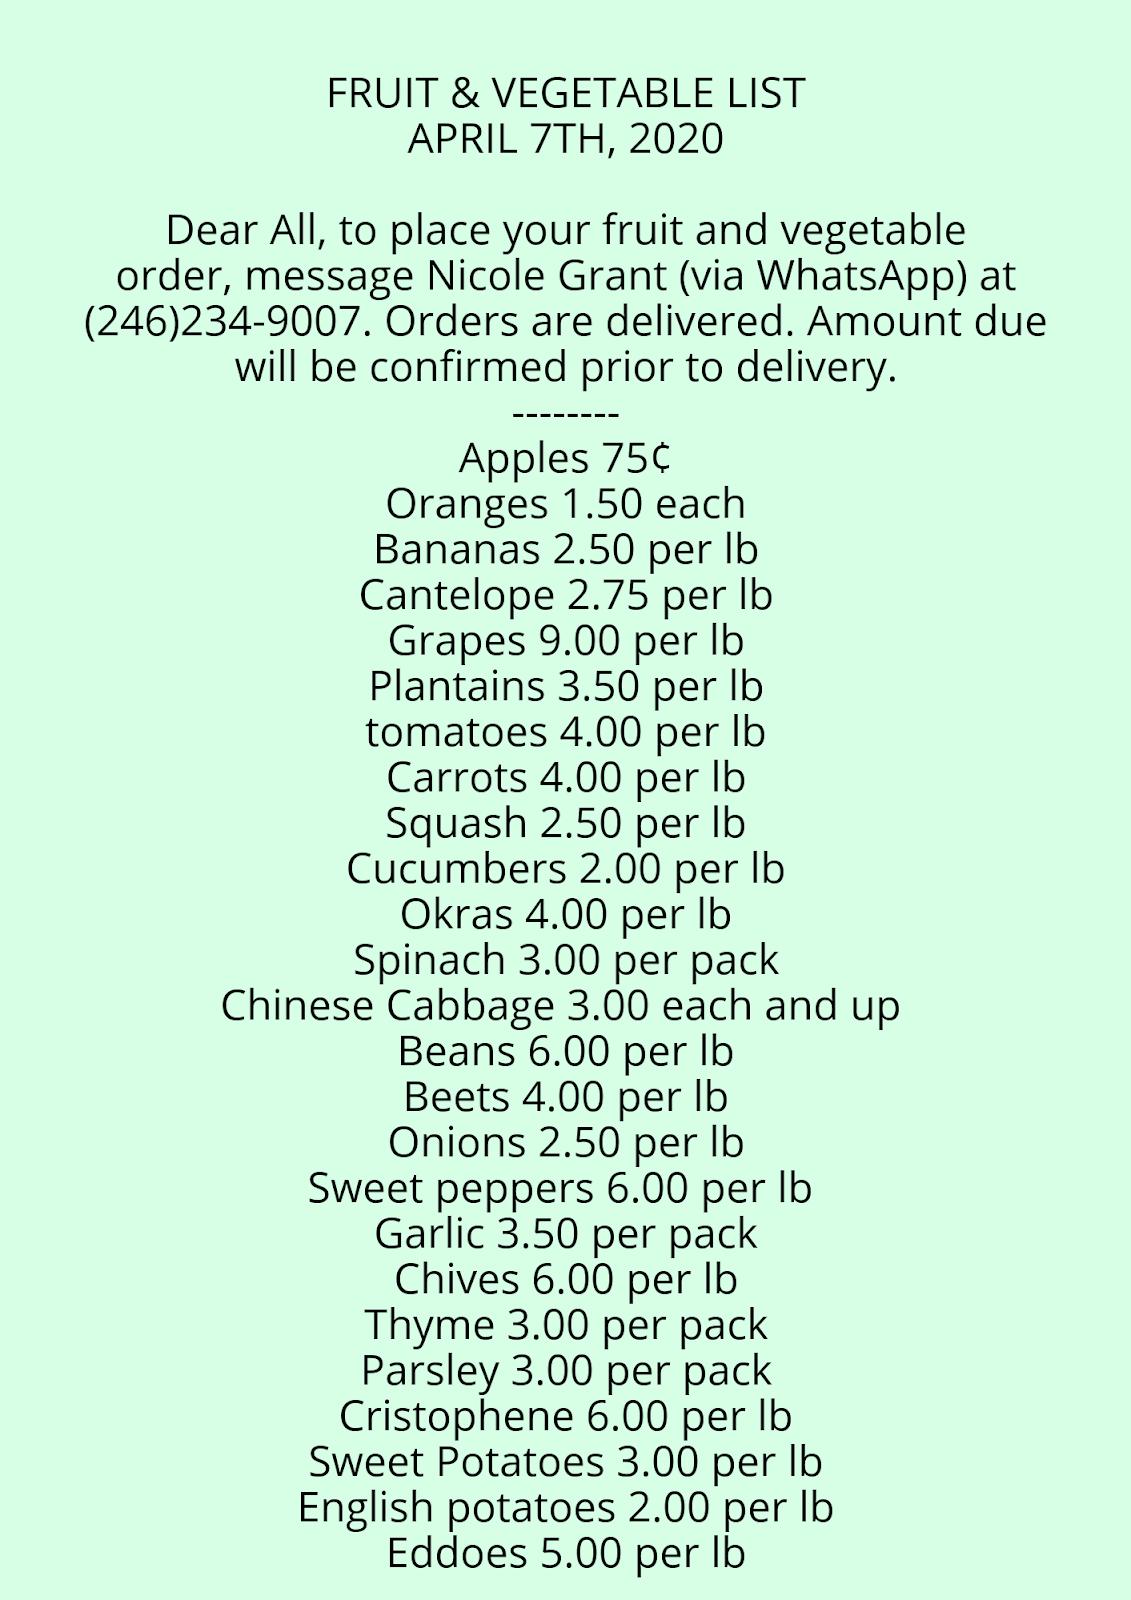 fruit-vegetable-list-nicole-grant-april7th2020